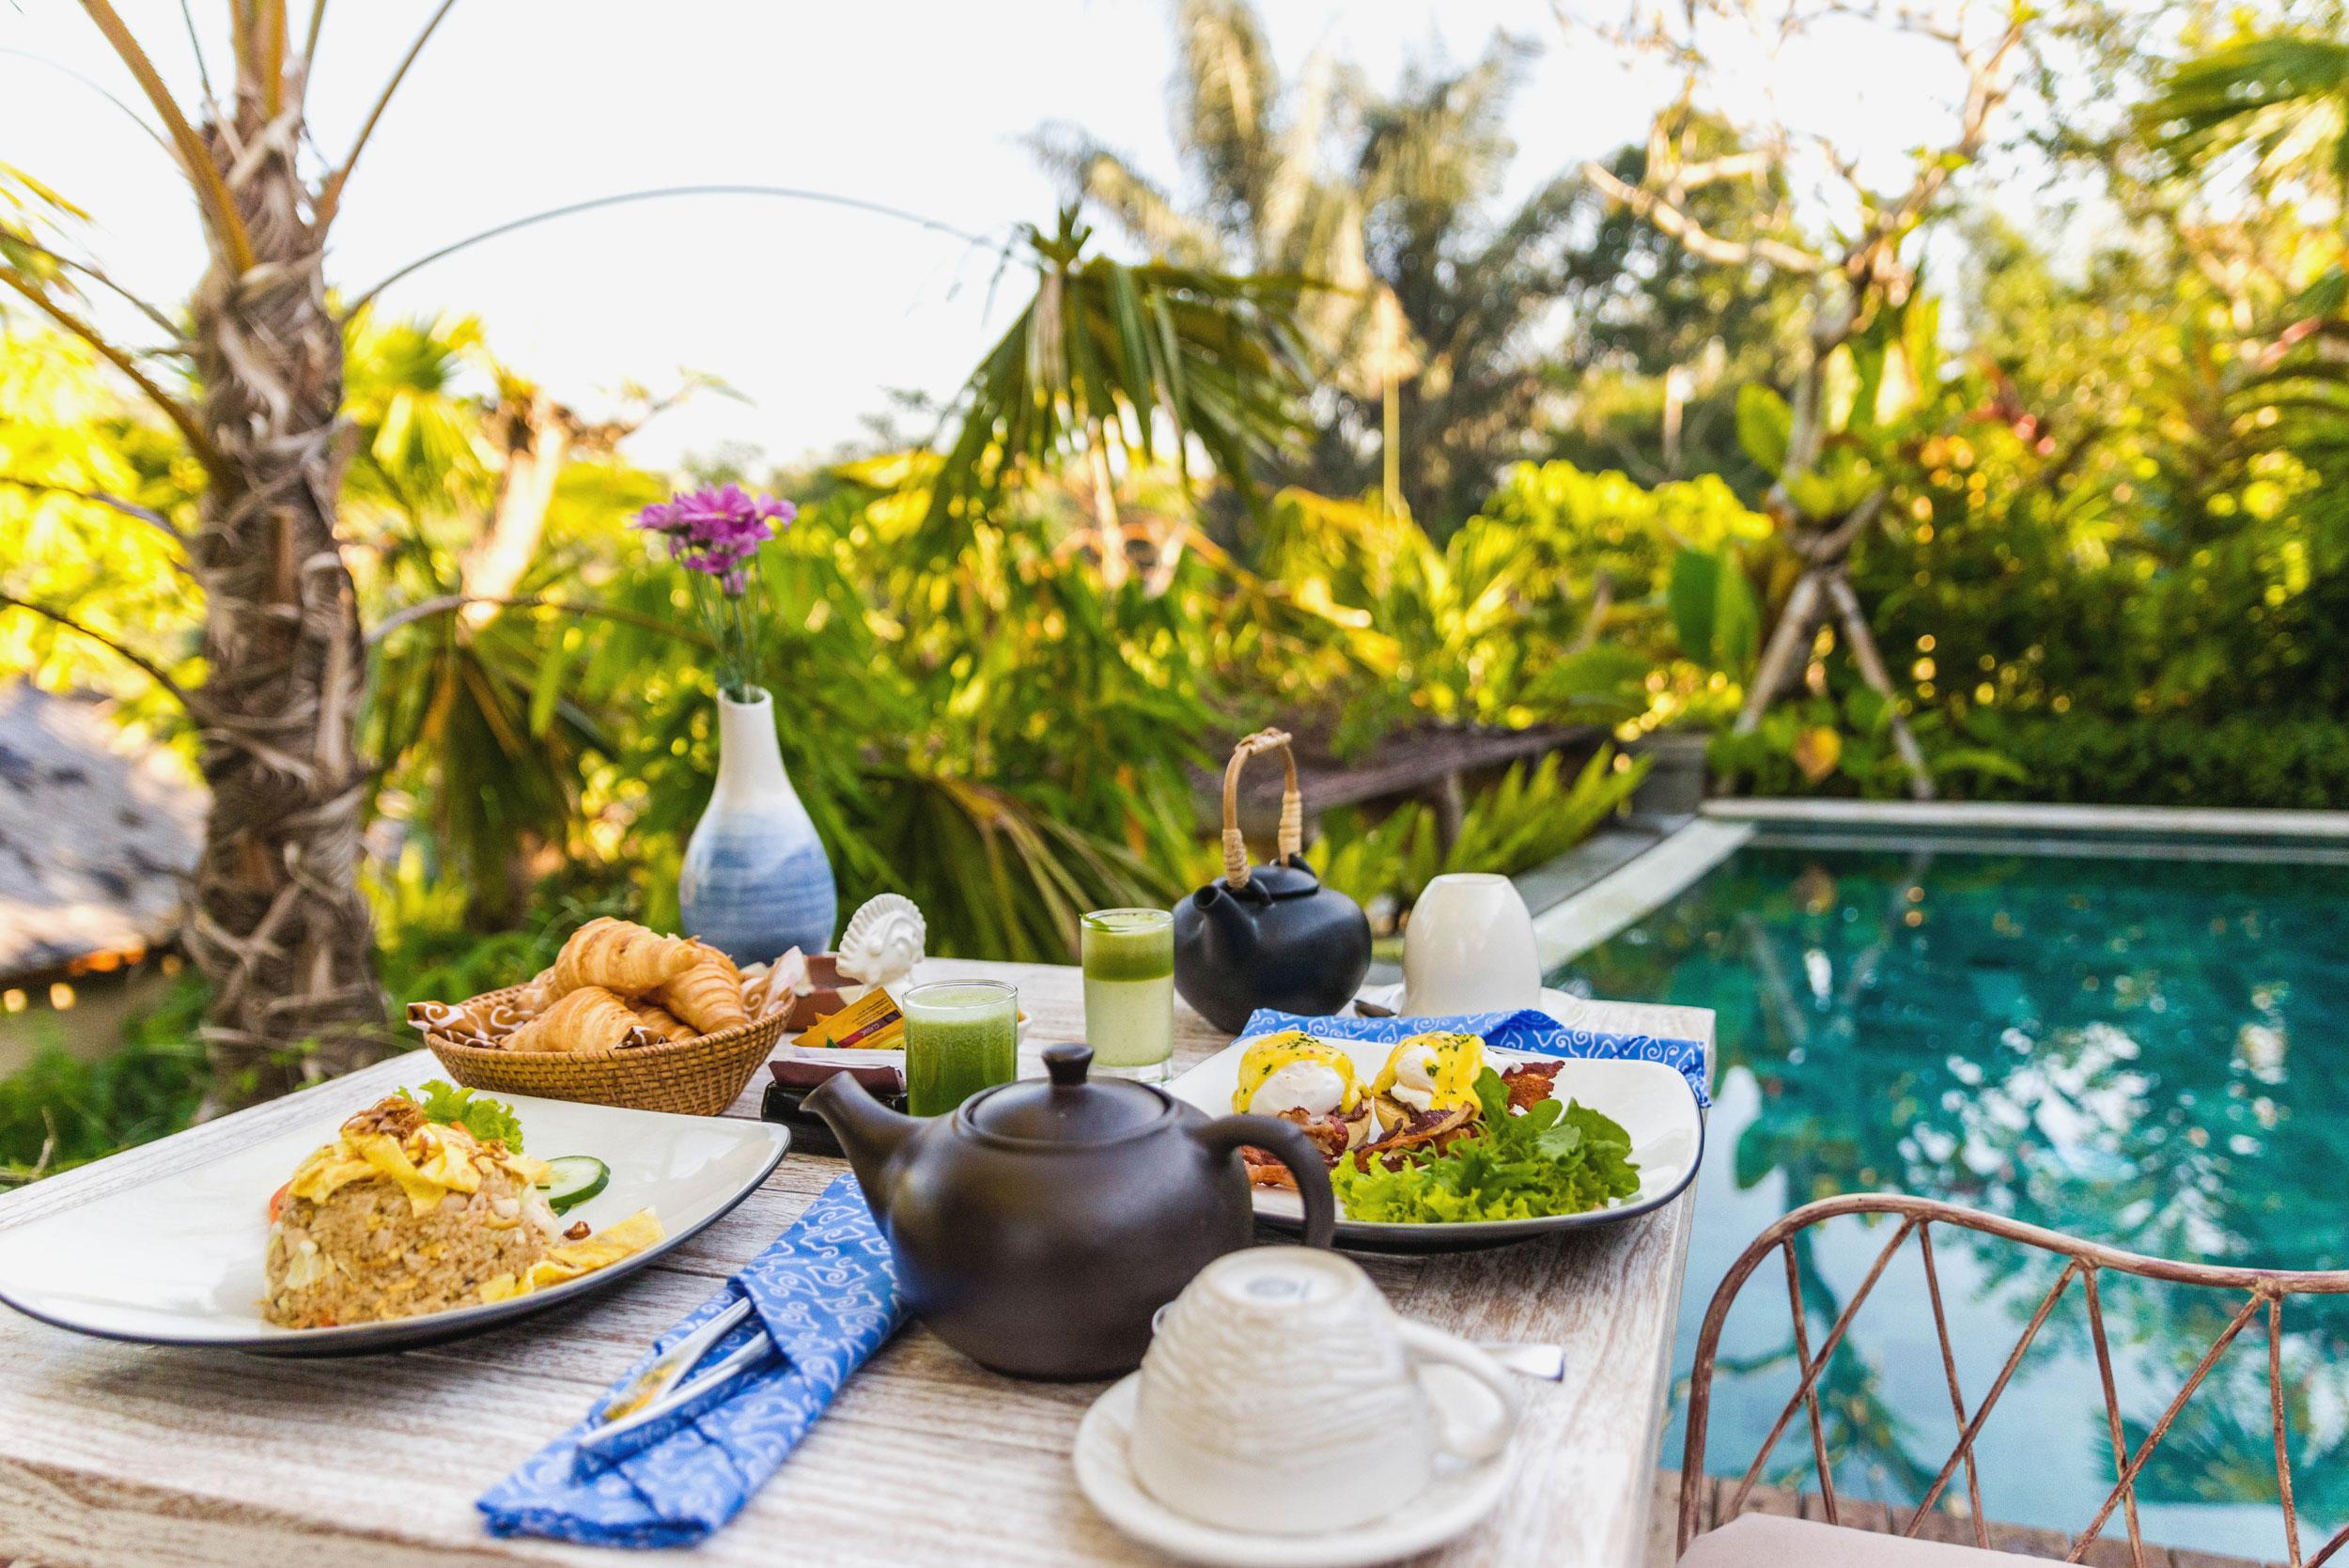 Breakfast at Nau Villas, Ubud in Bali